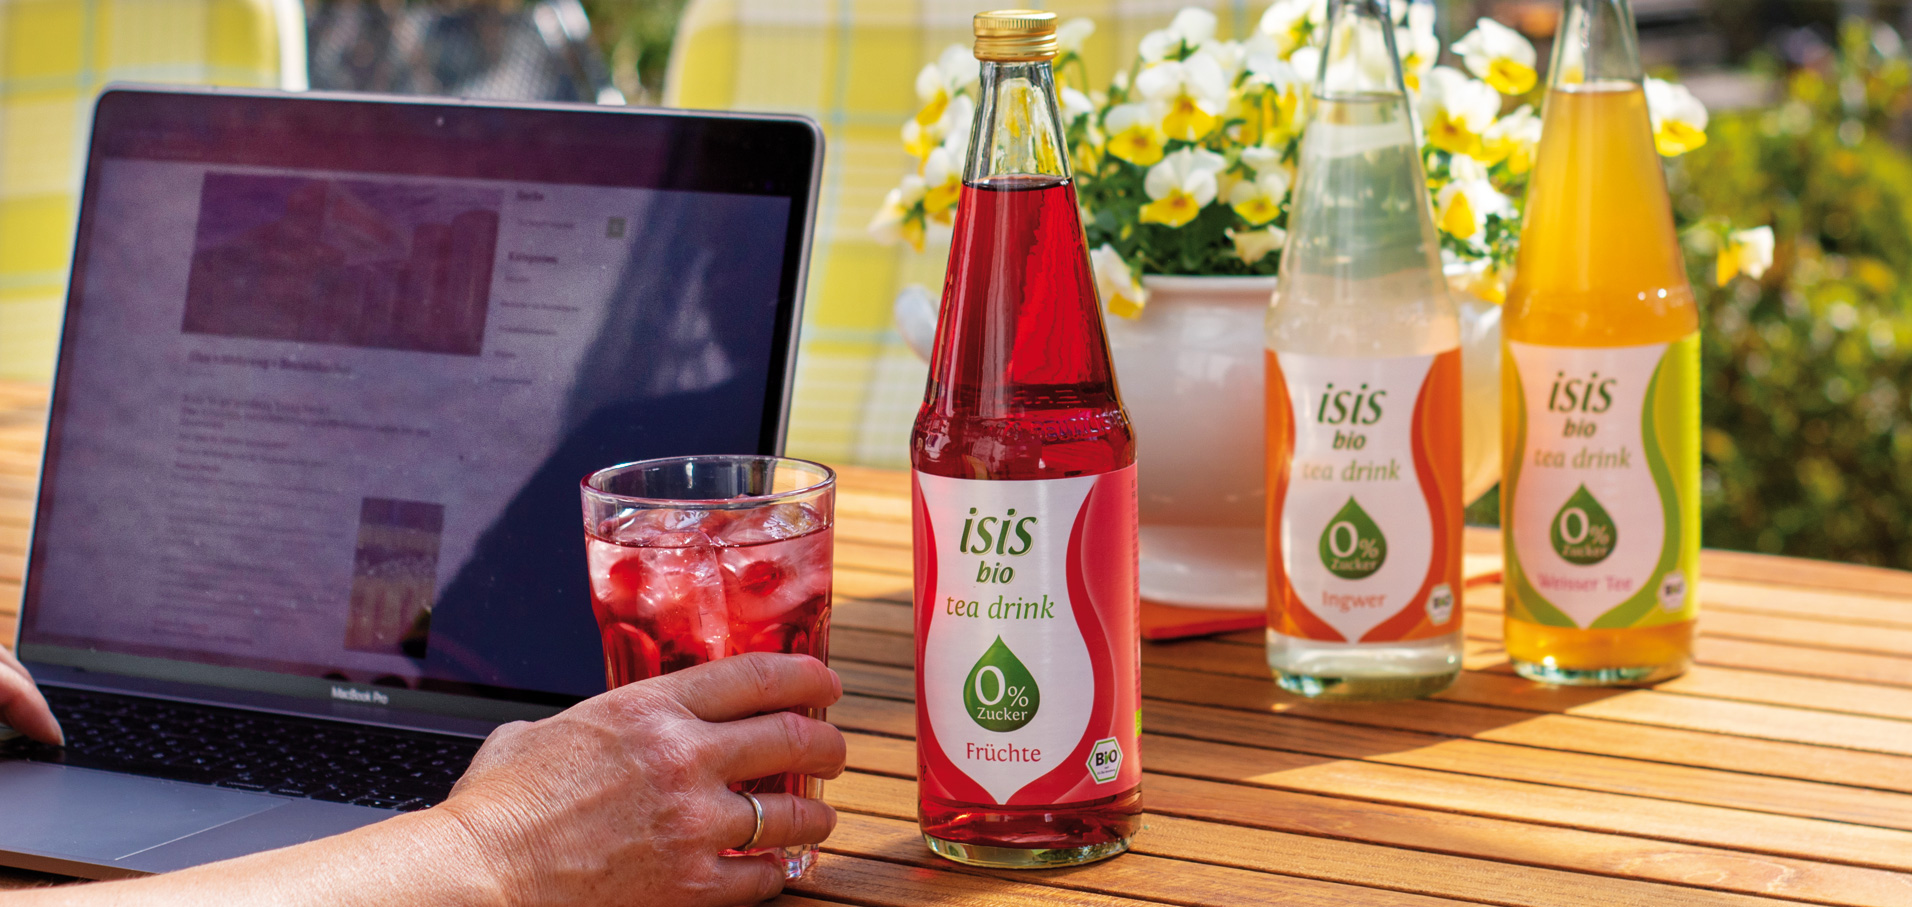 isis Bio tea drinks Erfrischungsgetränke Beutelsbacher